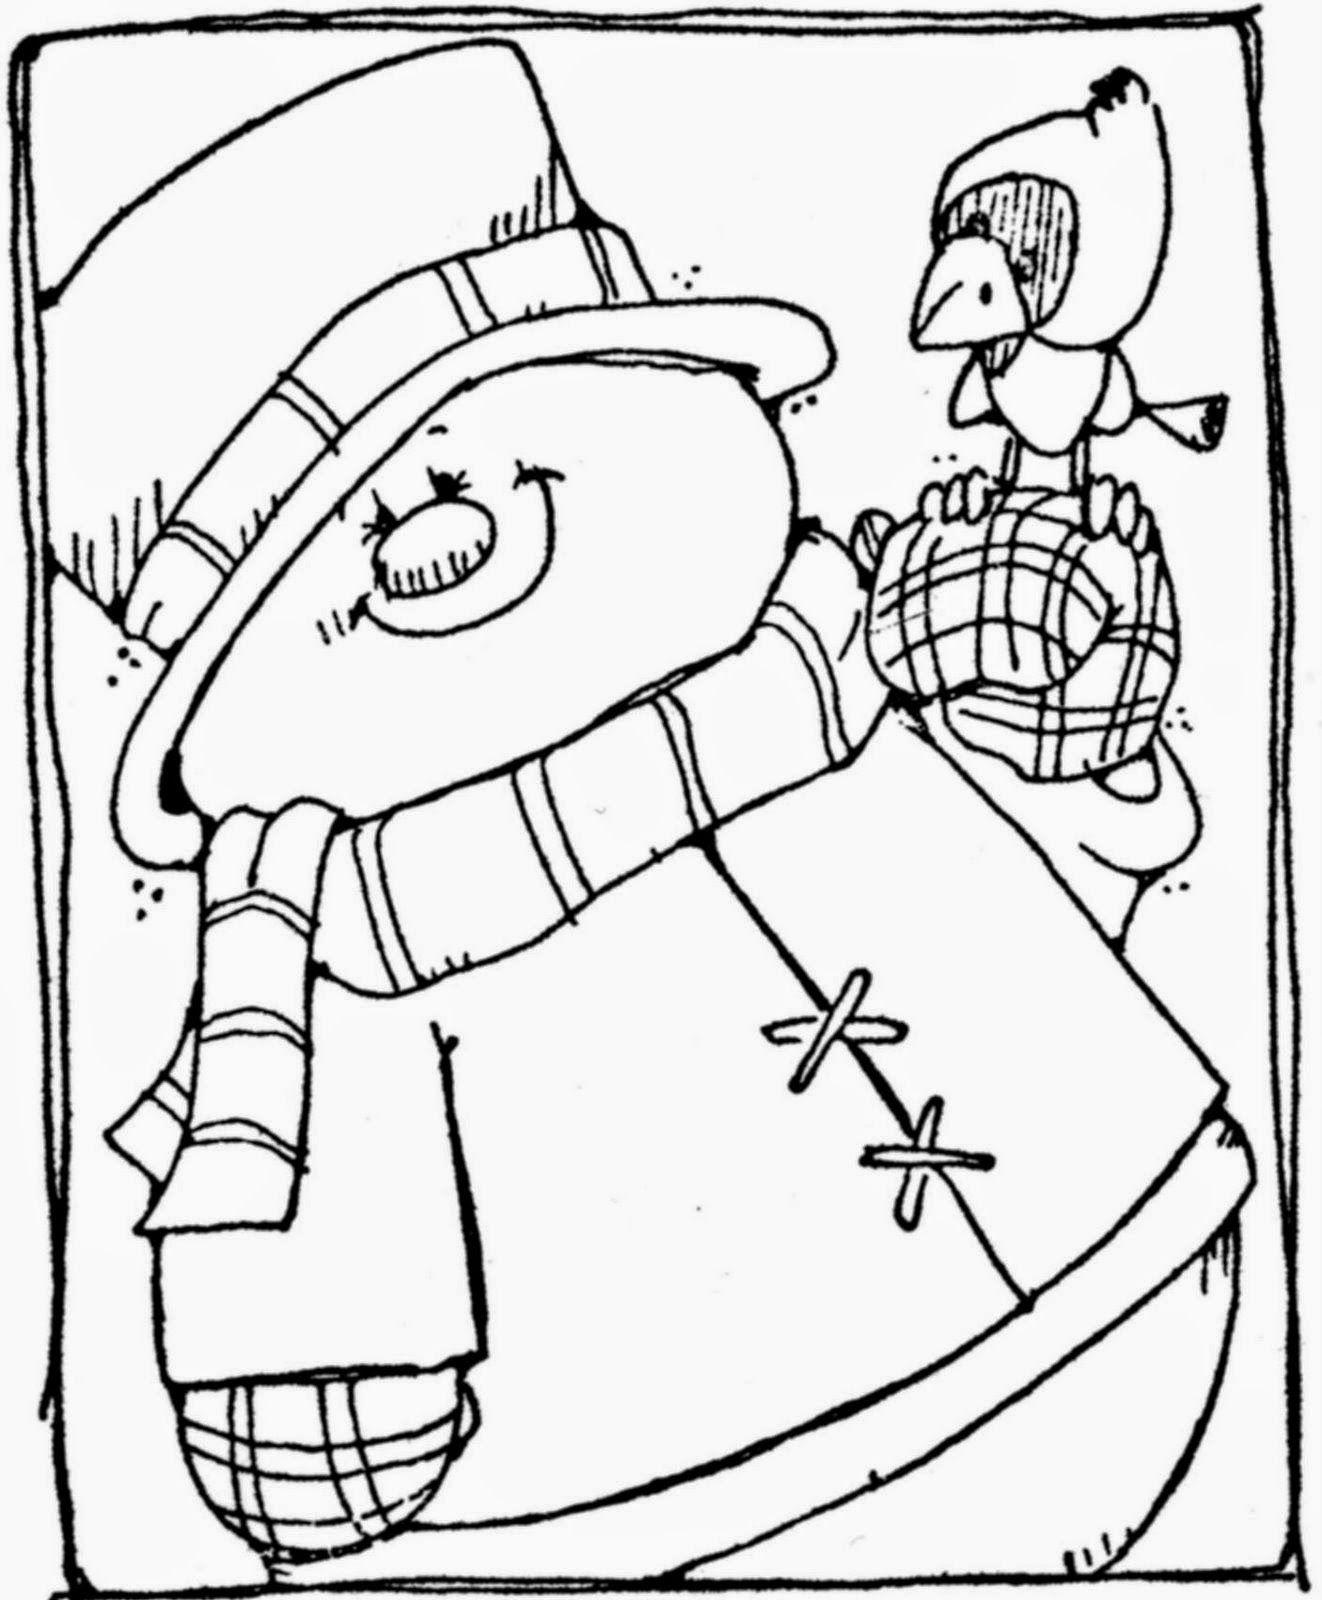 Snowman Coloring Pages Snowman coloring pages, Coloring